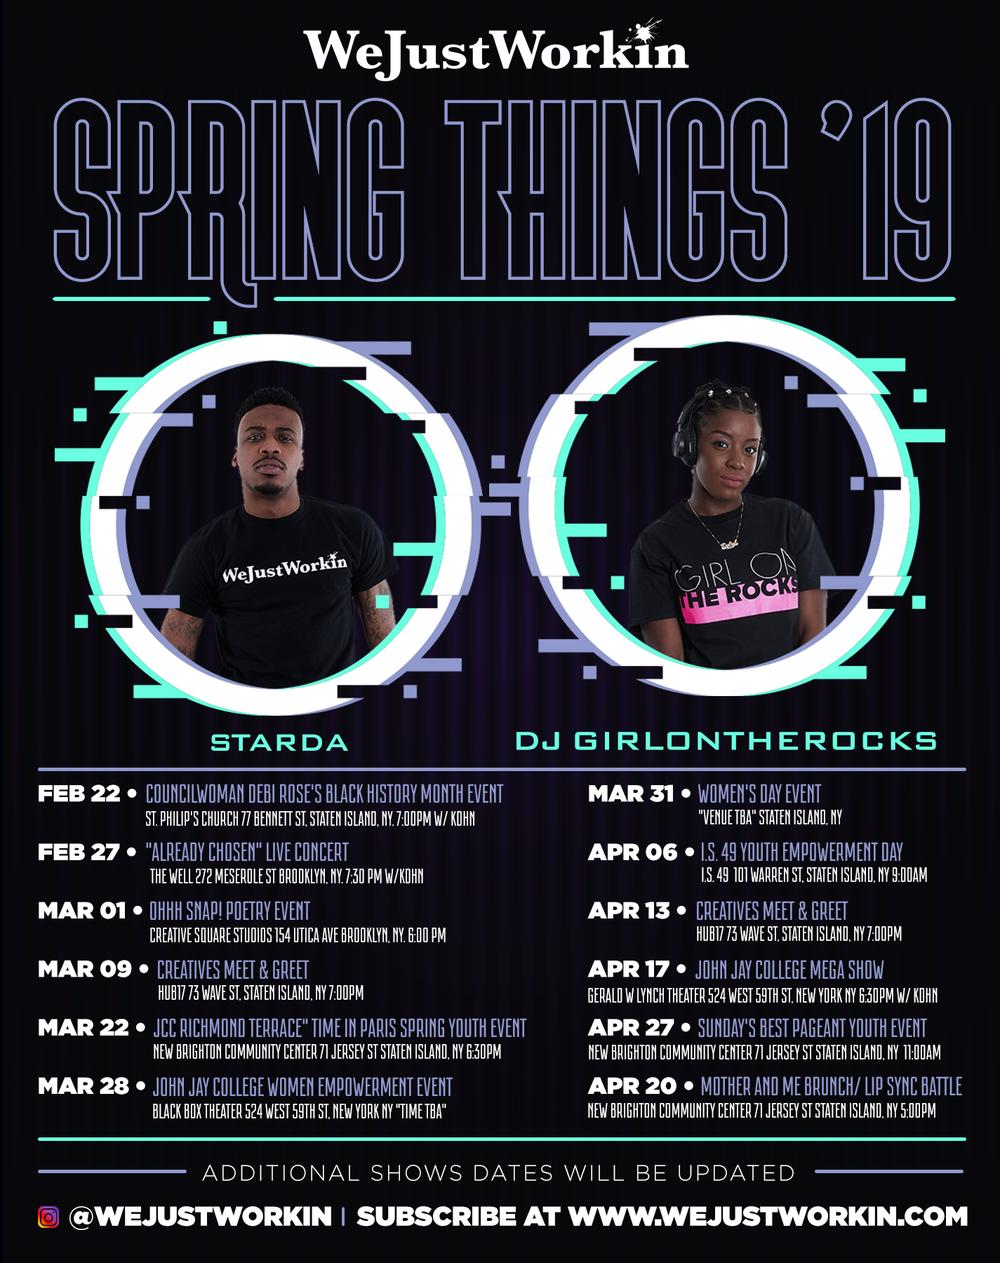 Spring-Show_Flyer-1_2019.png